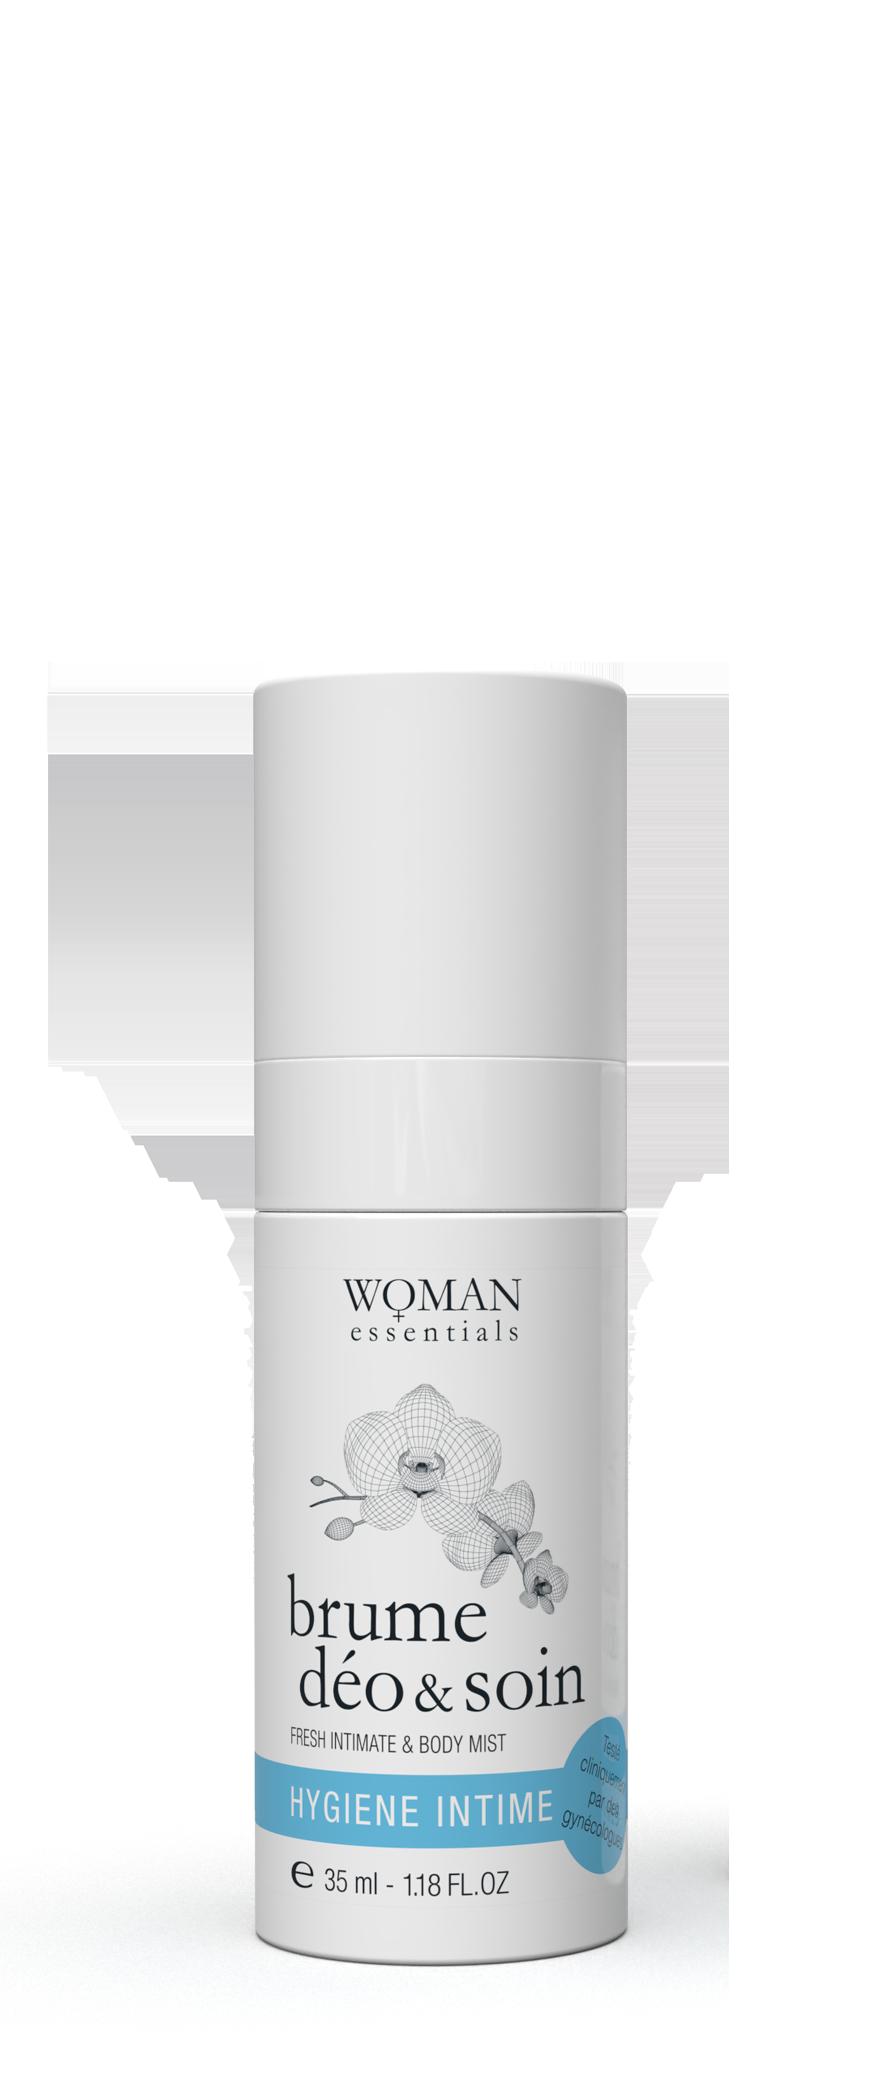 woman essential intimate deodorant deo spray feminine freshness mist natural anti perspirant hygiene